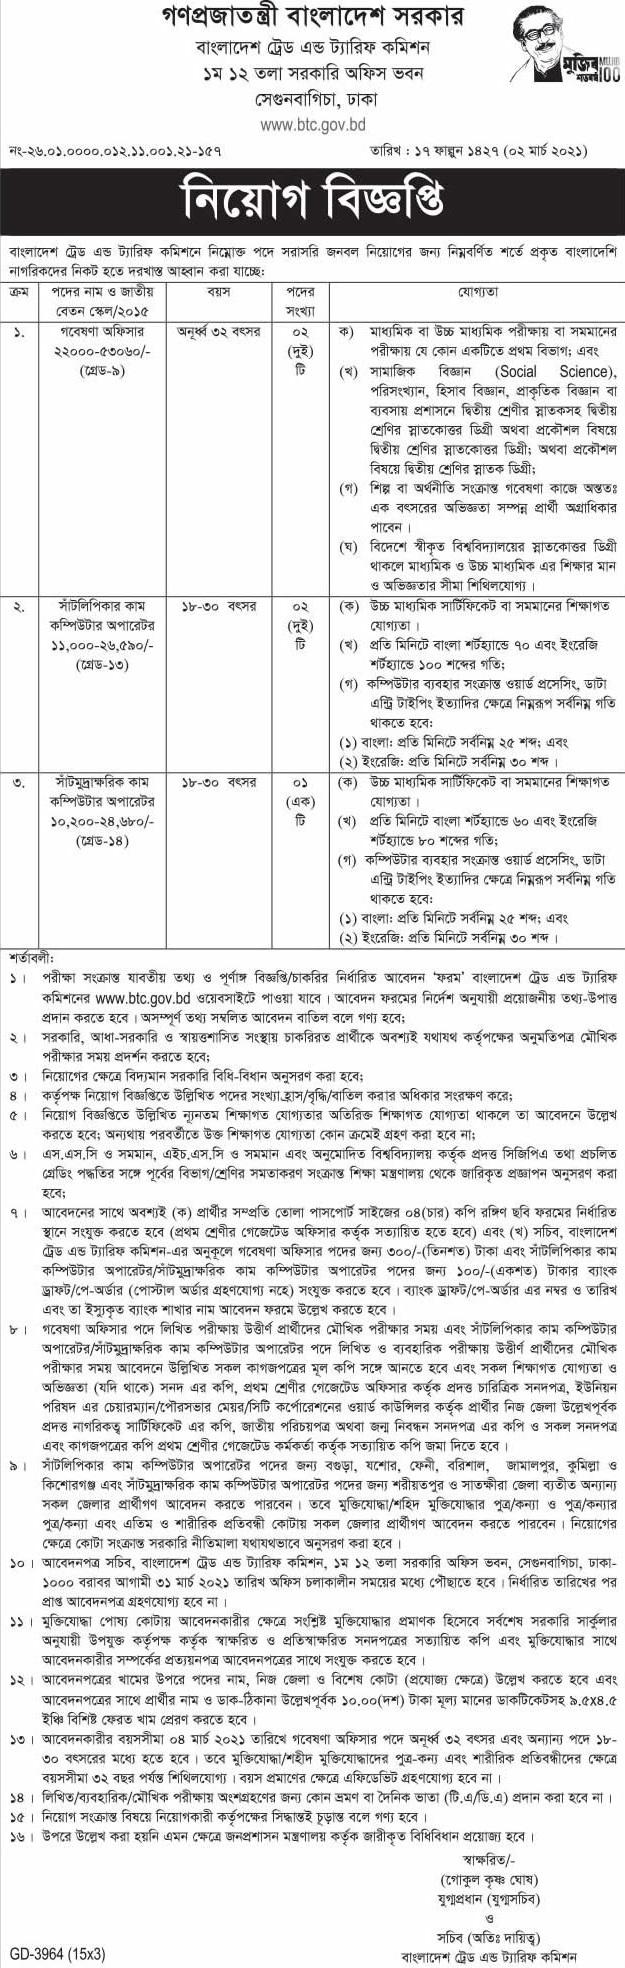 Bangladesh Tariff Commission Job Circular March 2021